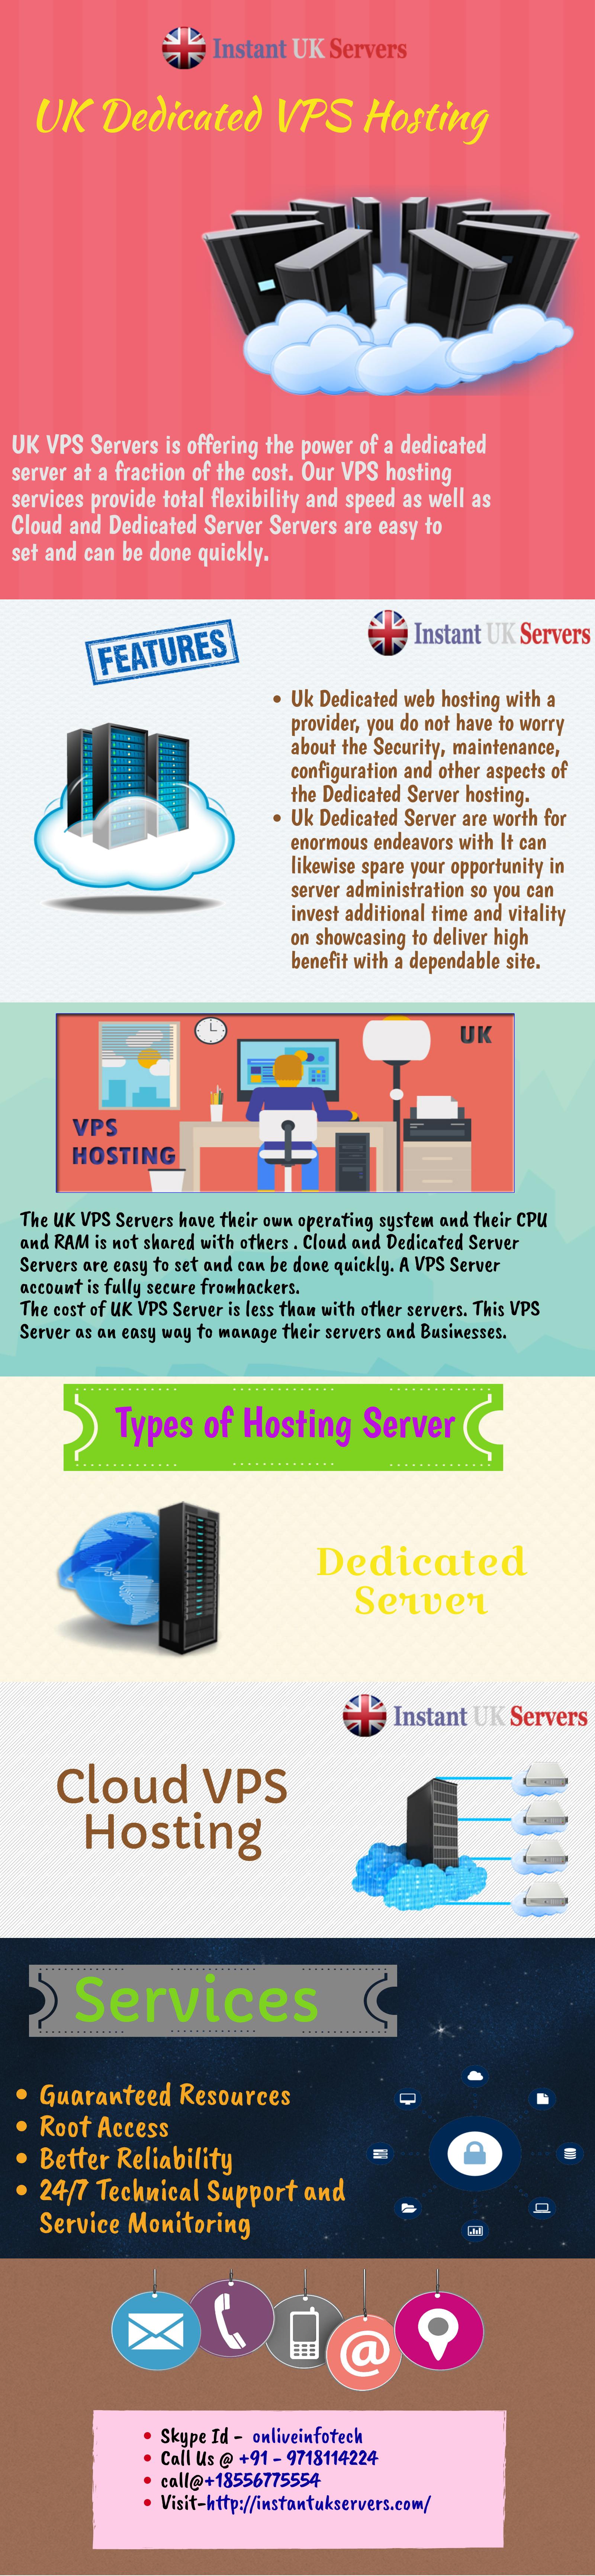 UK Dedicated Server Hosting has very popular